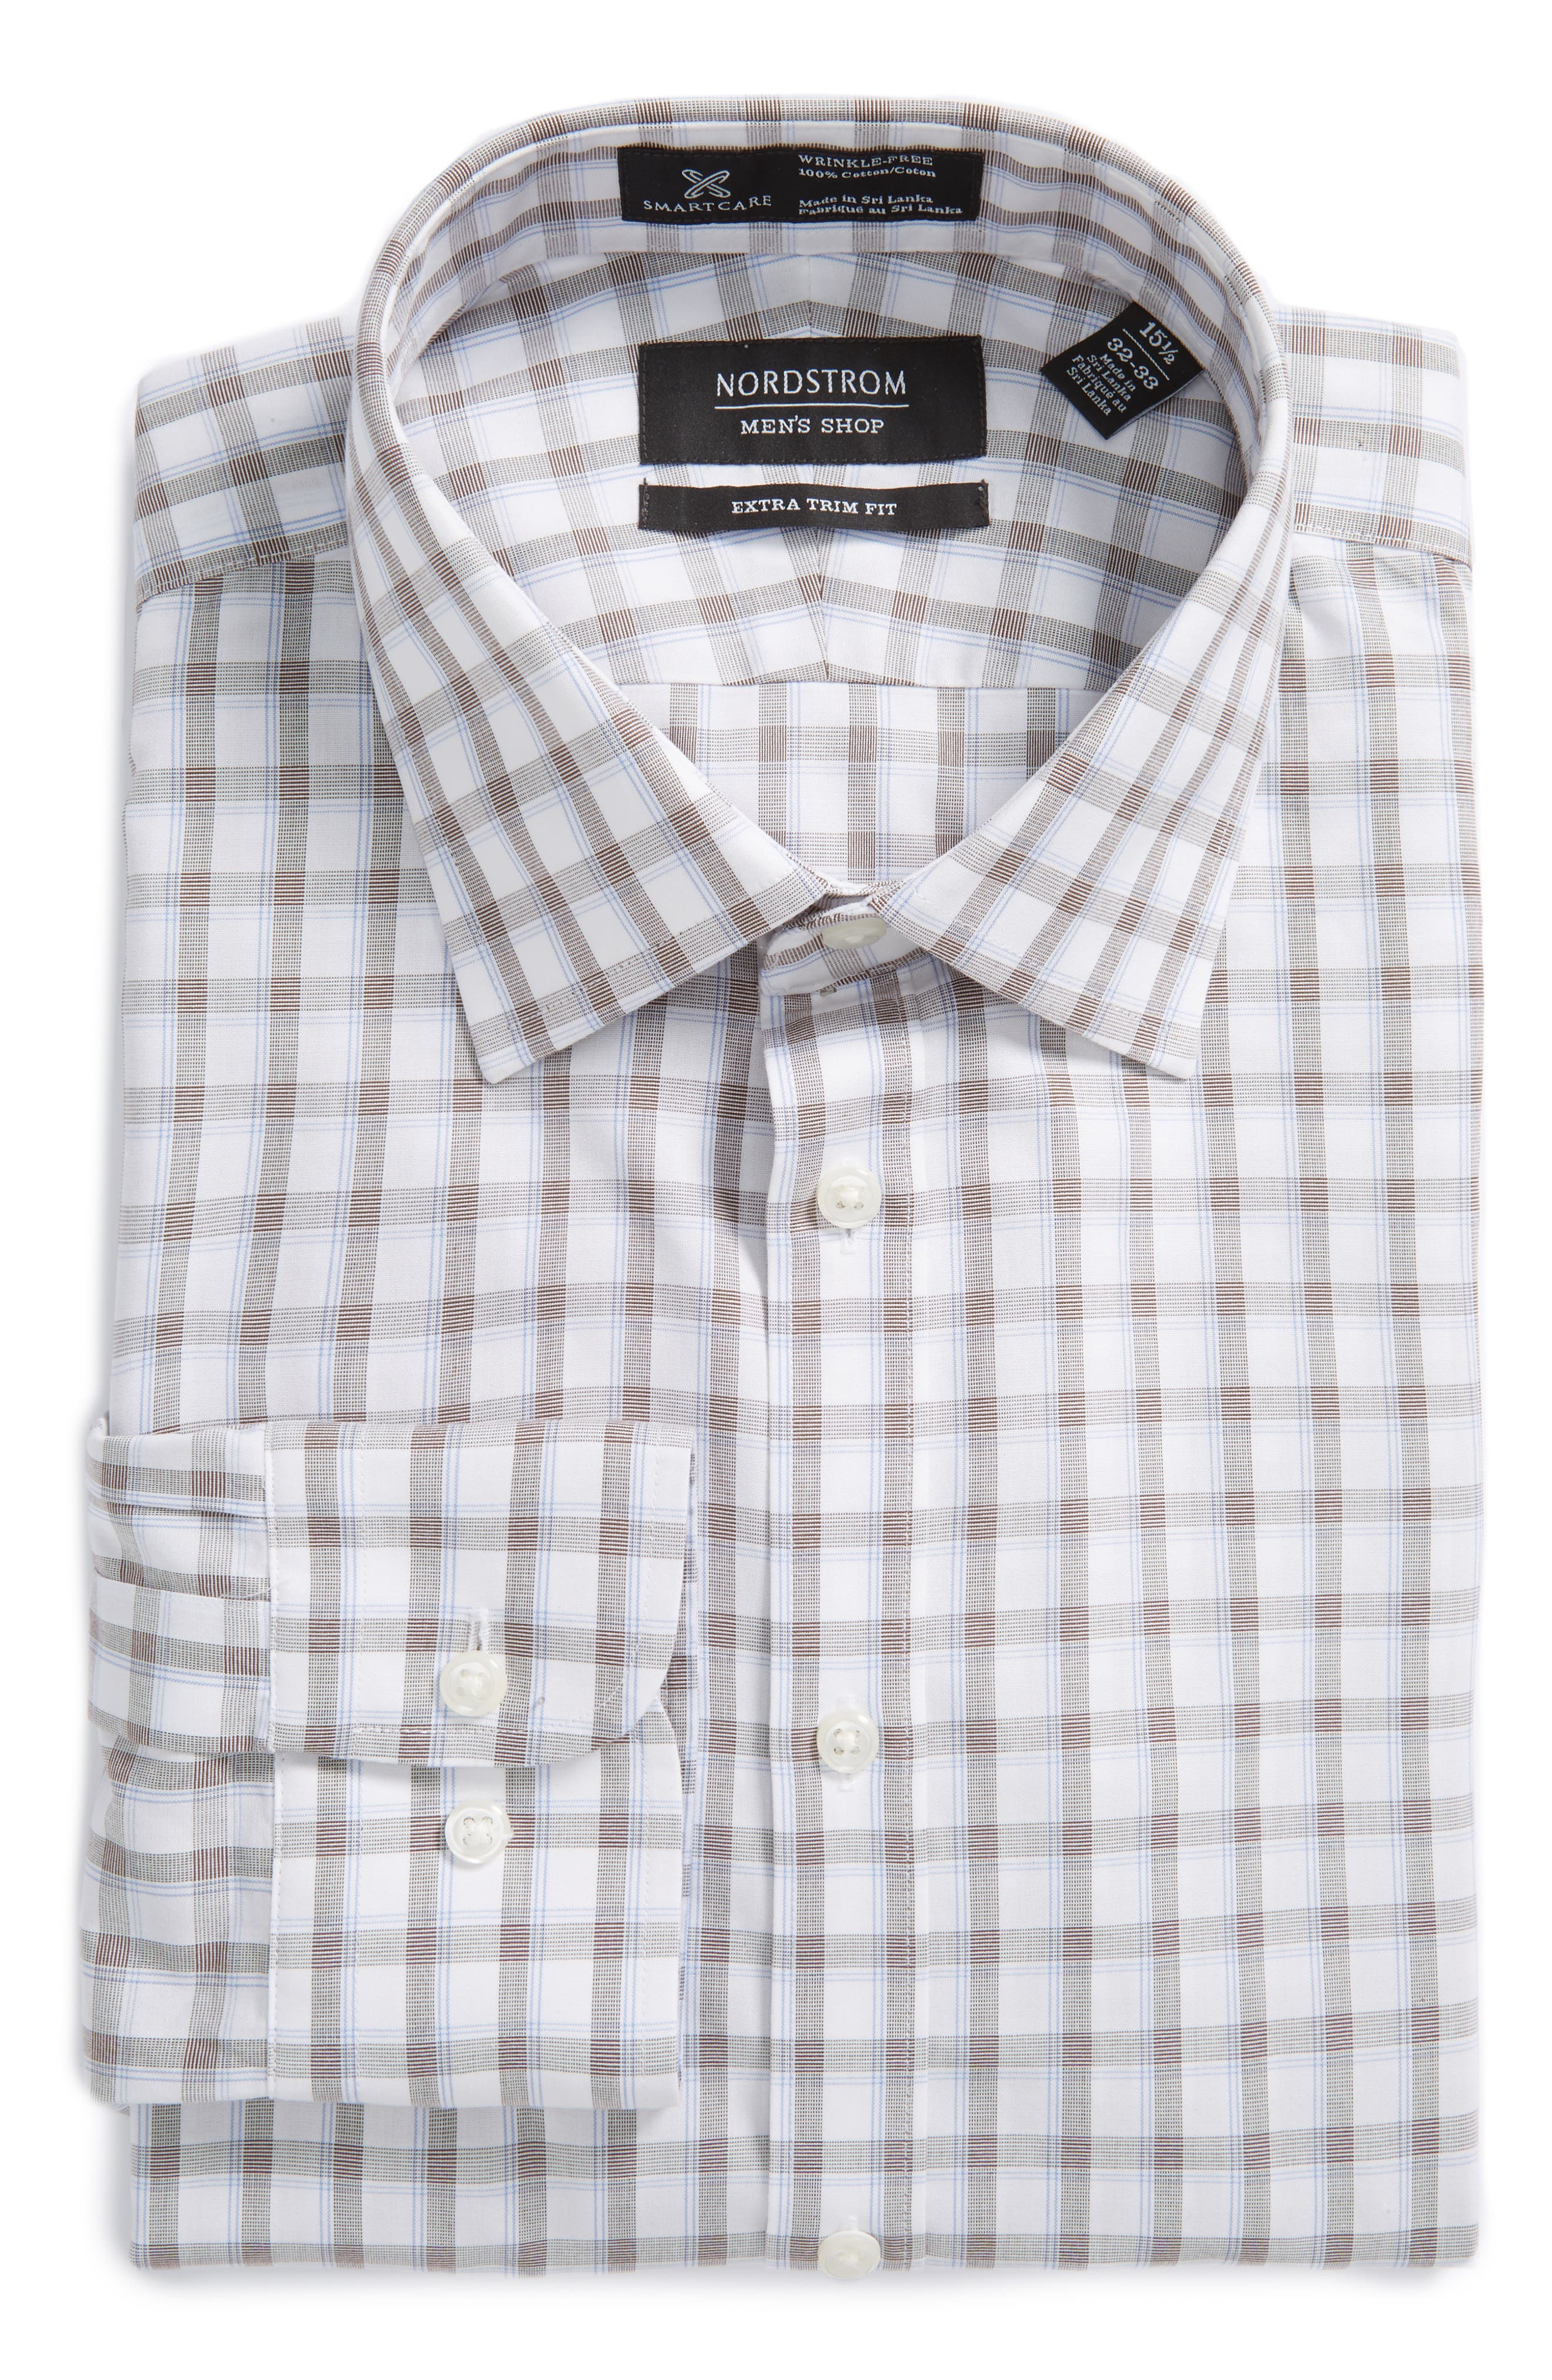 Alternate Image 1 Selected - Nordstrom Men's Shop Smartcare™ Extra Trim Fit Plaid Dress Shirt